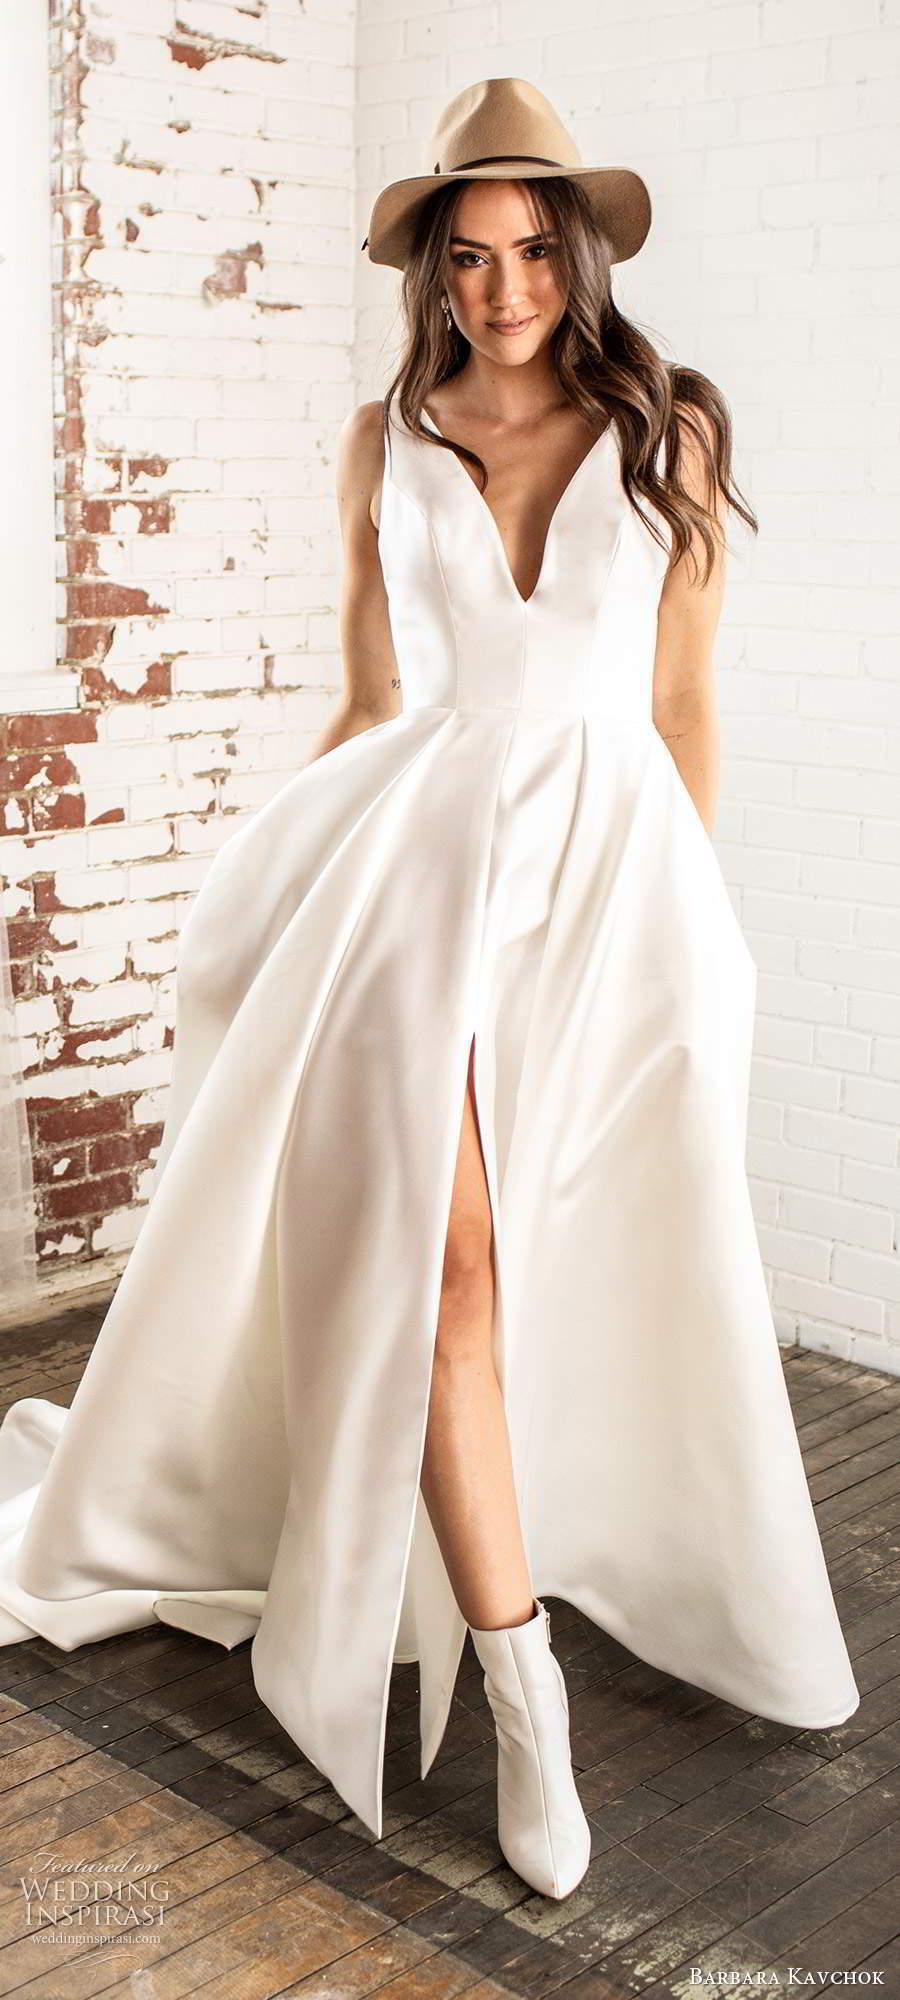 barbara kavchok fall 2020 bridal sleeveless thick straps plunging v neckline clean minimally embellished a line ball gown wedding dress chapel train (8) mv